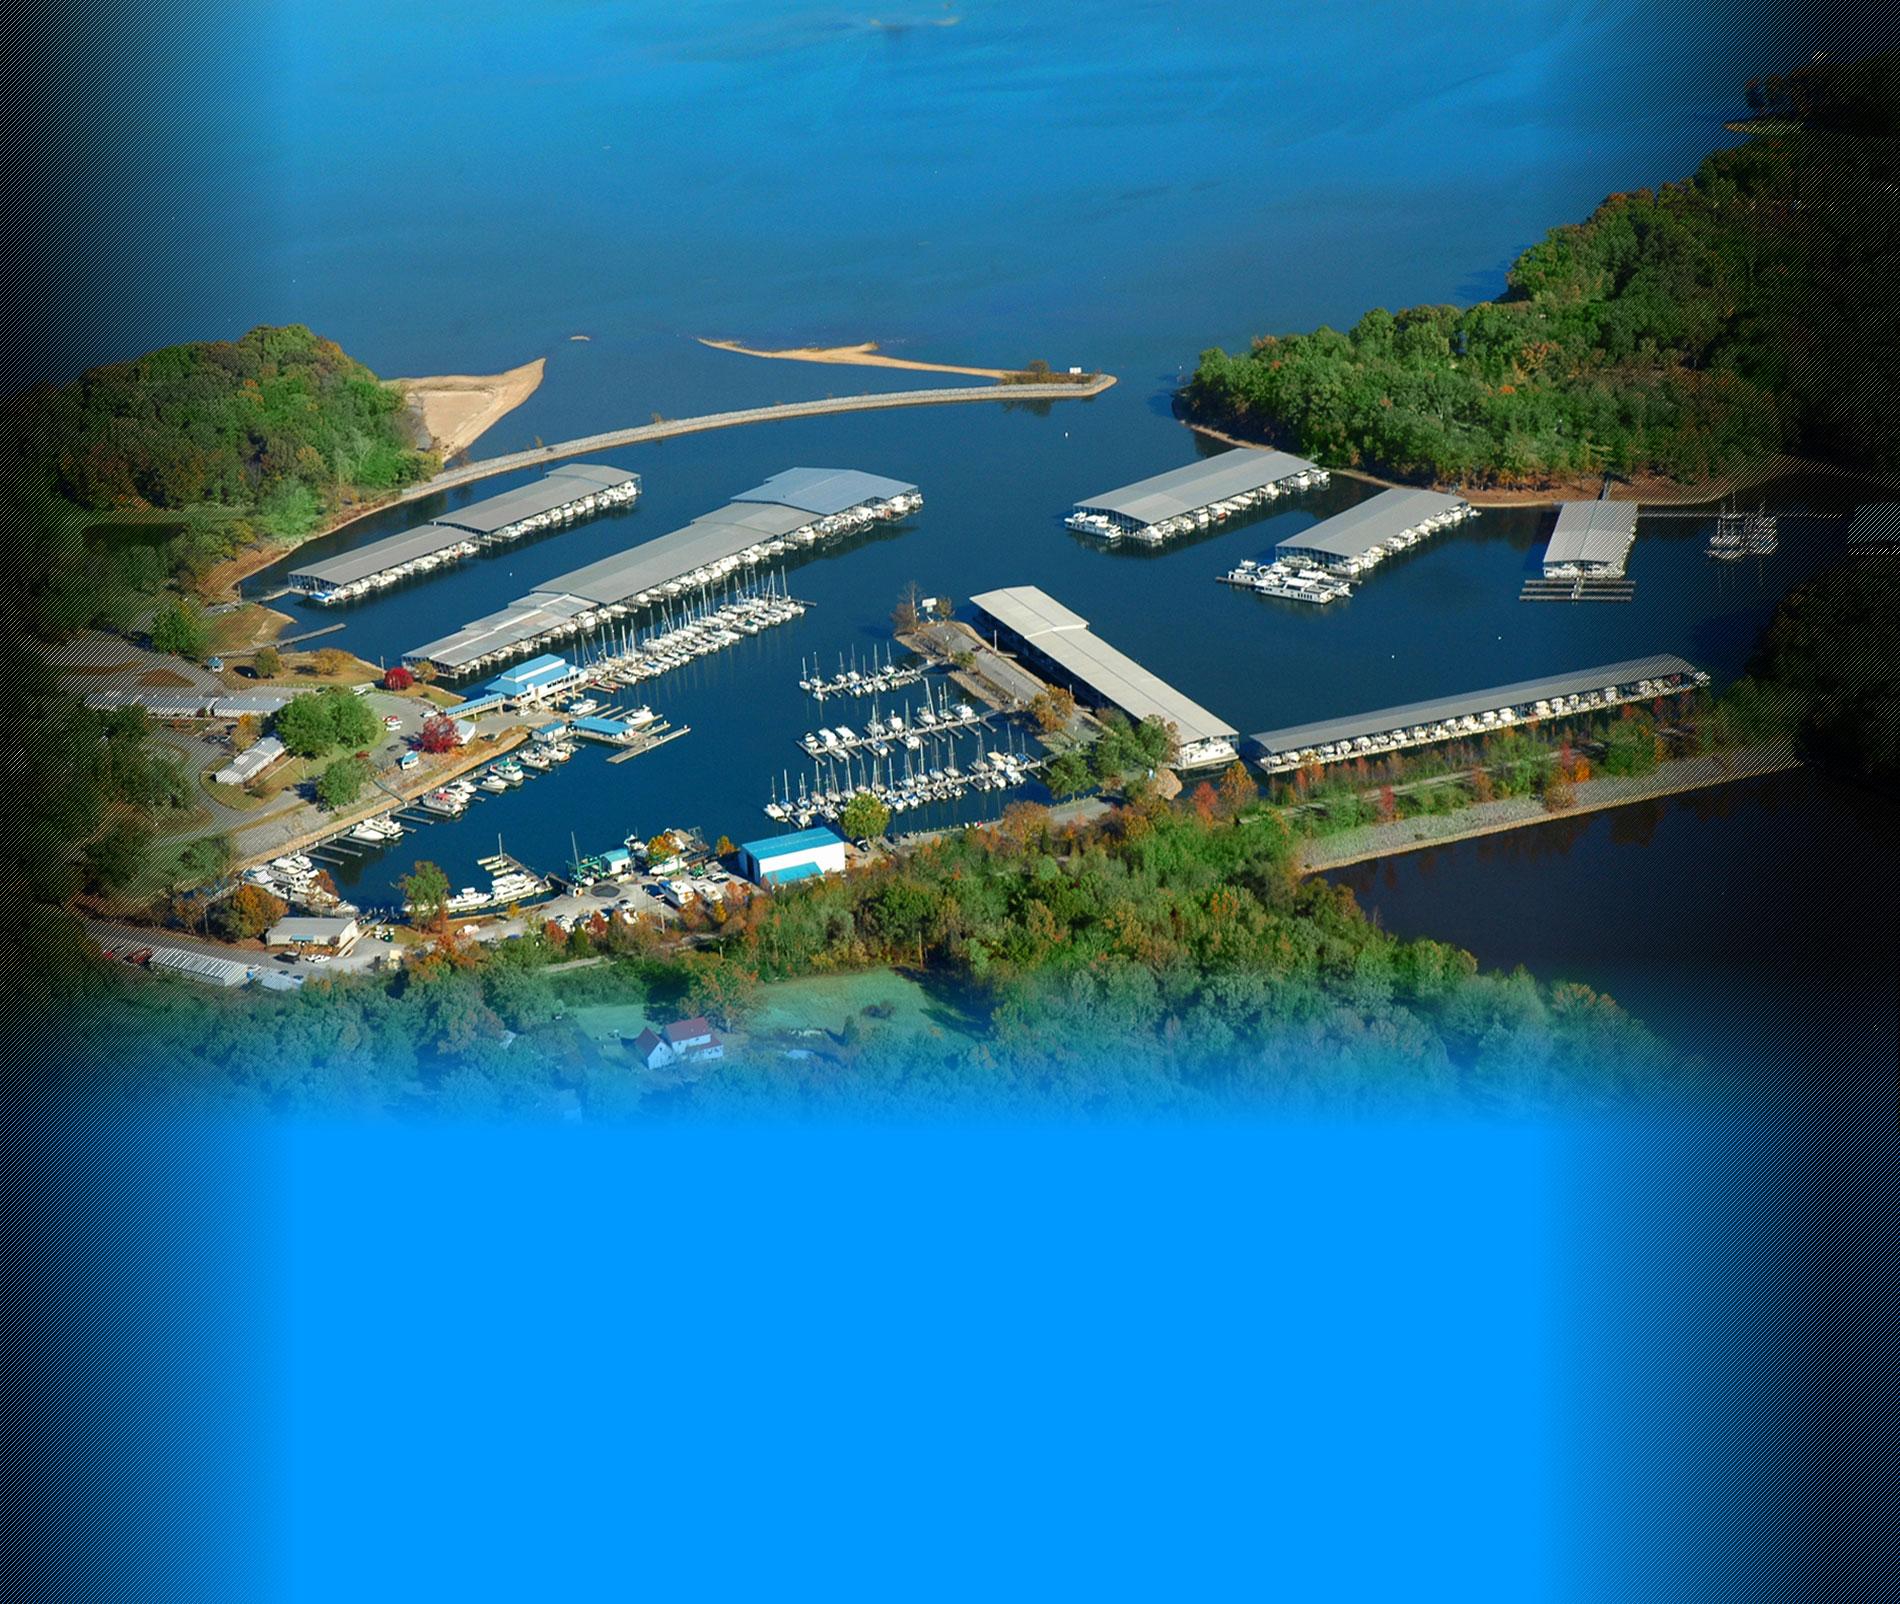 Green Turtle Bay Resort Marina in Grand Rivers, KY